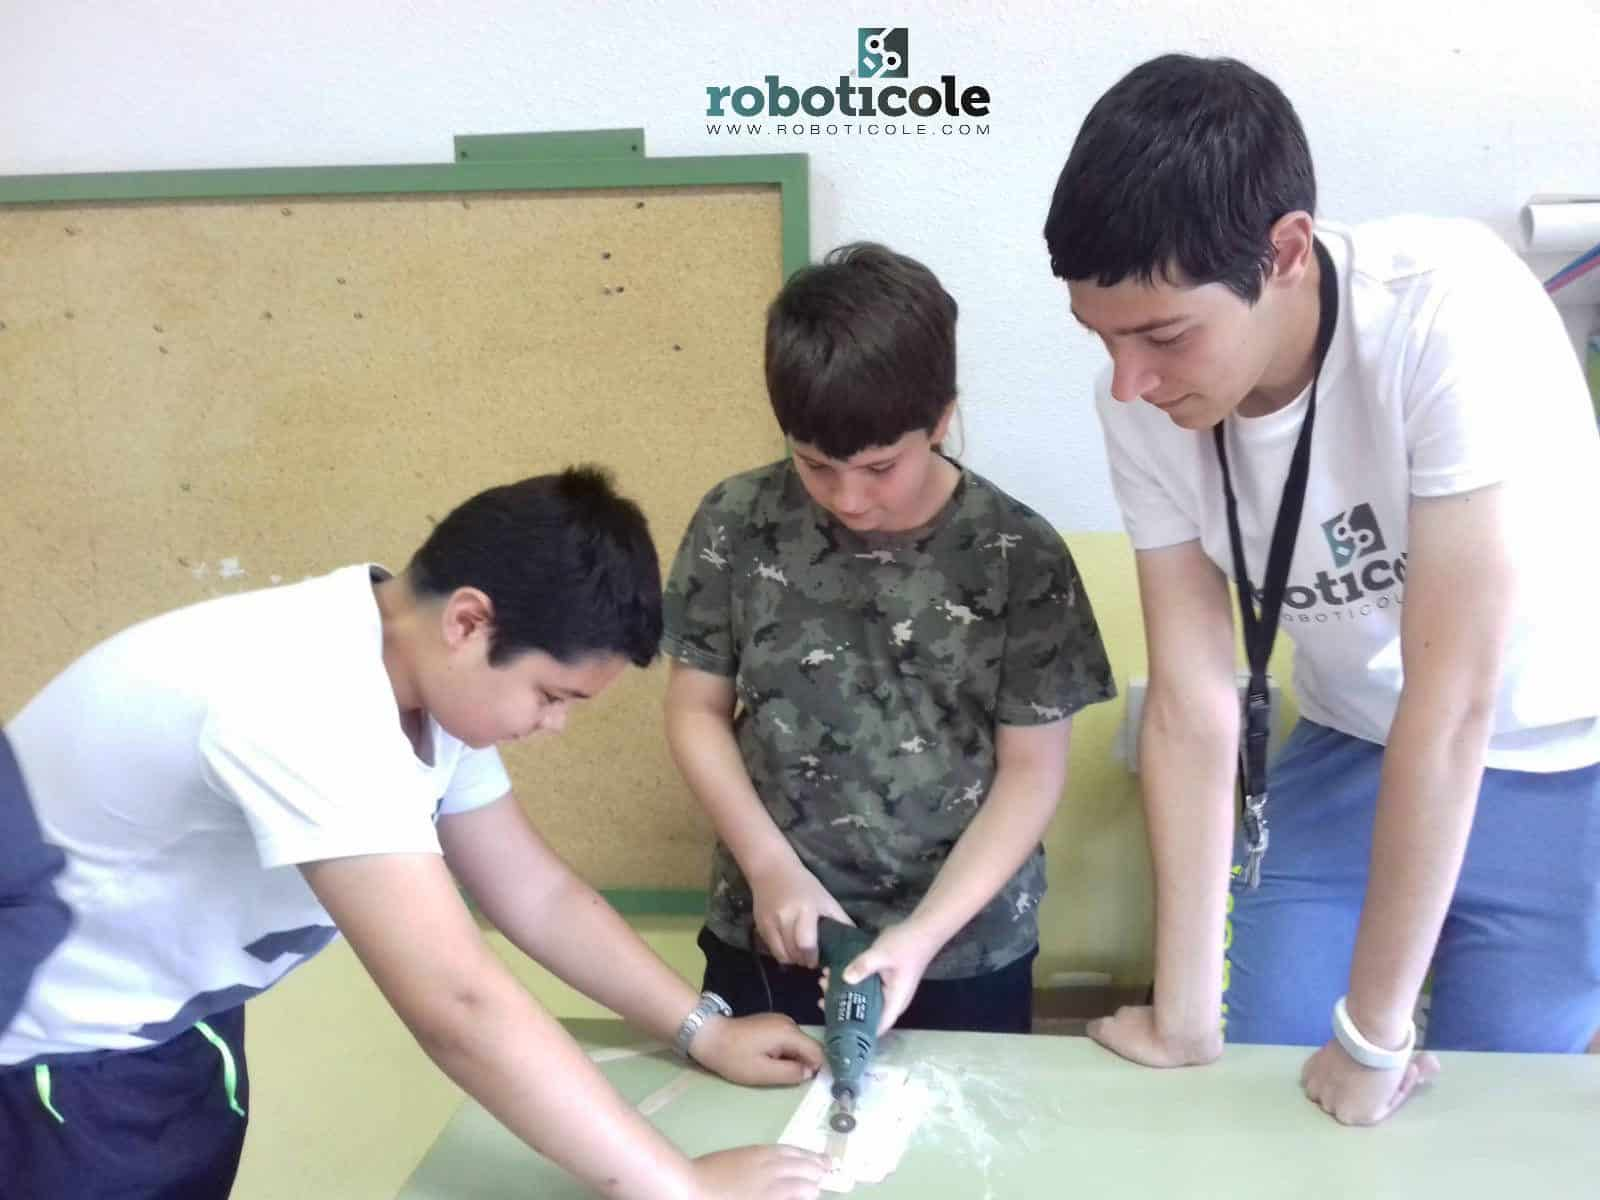 Roboticole